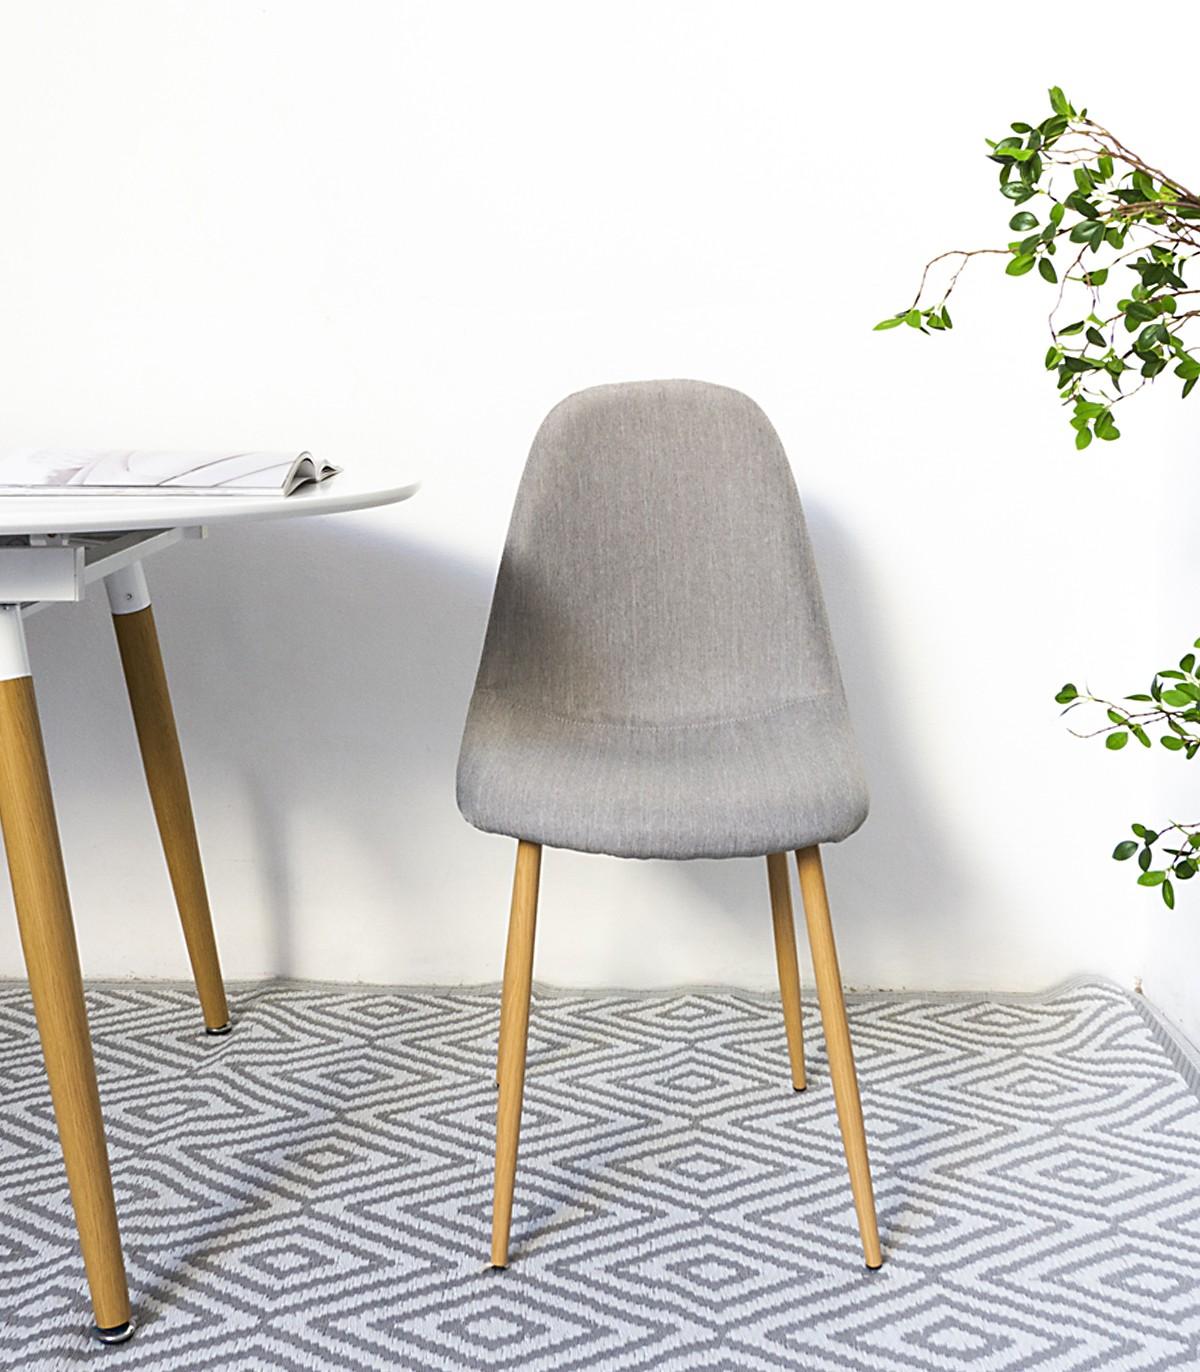 Silla rústica Oslo, con patas de madera